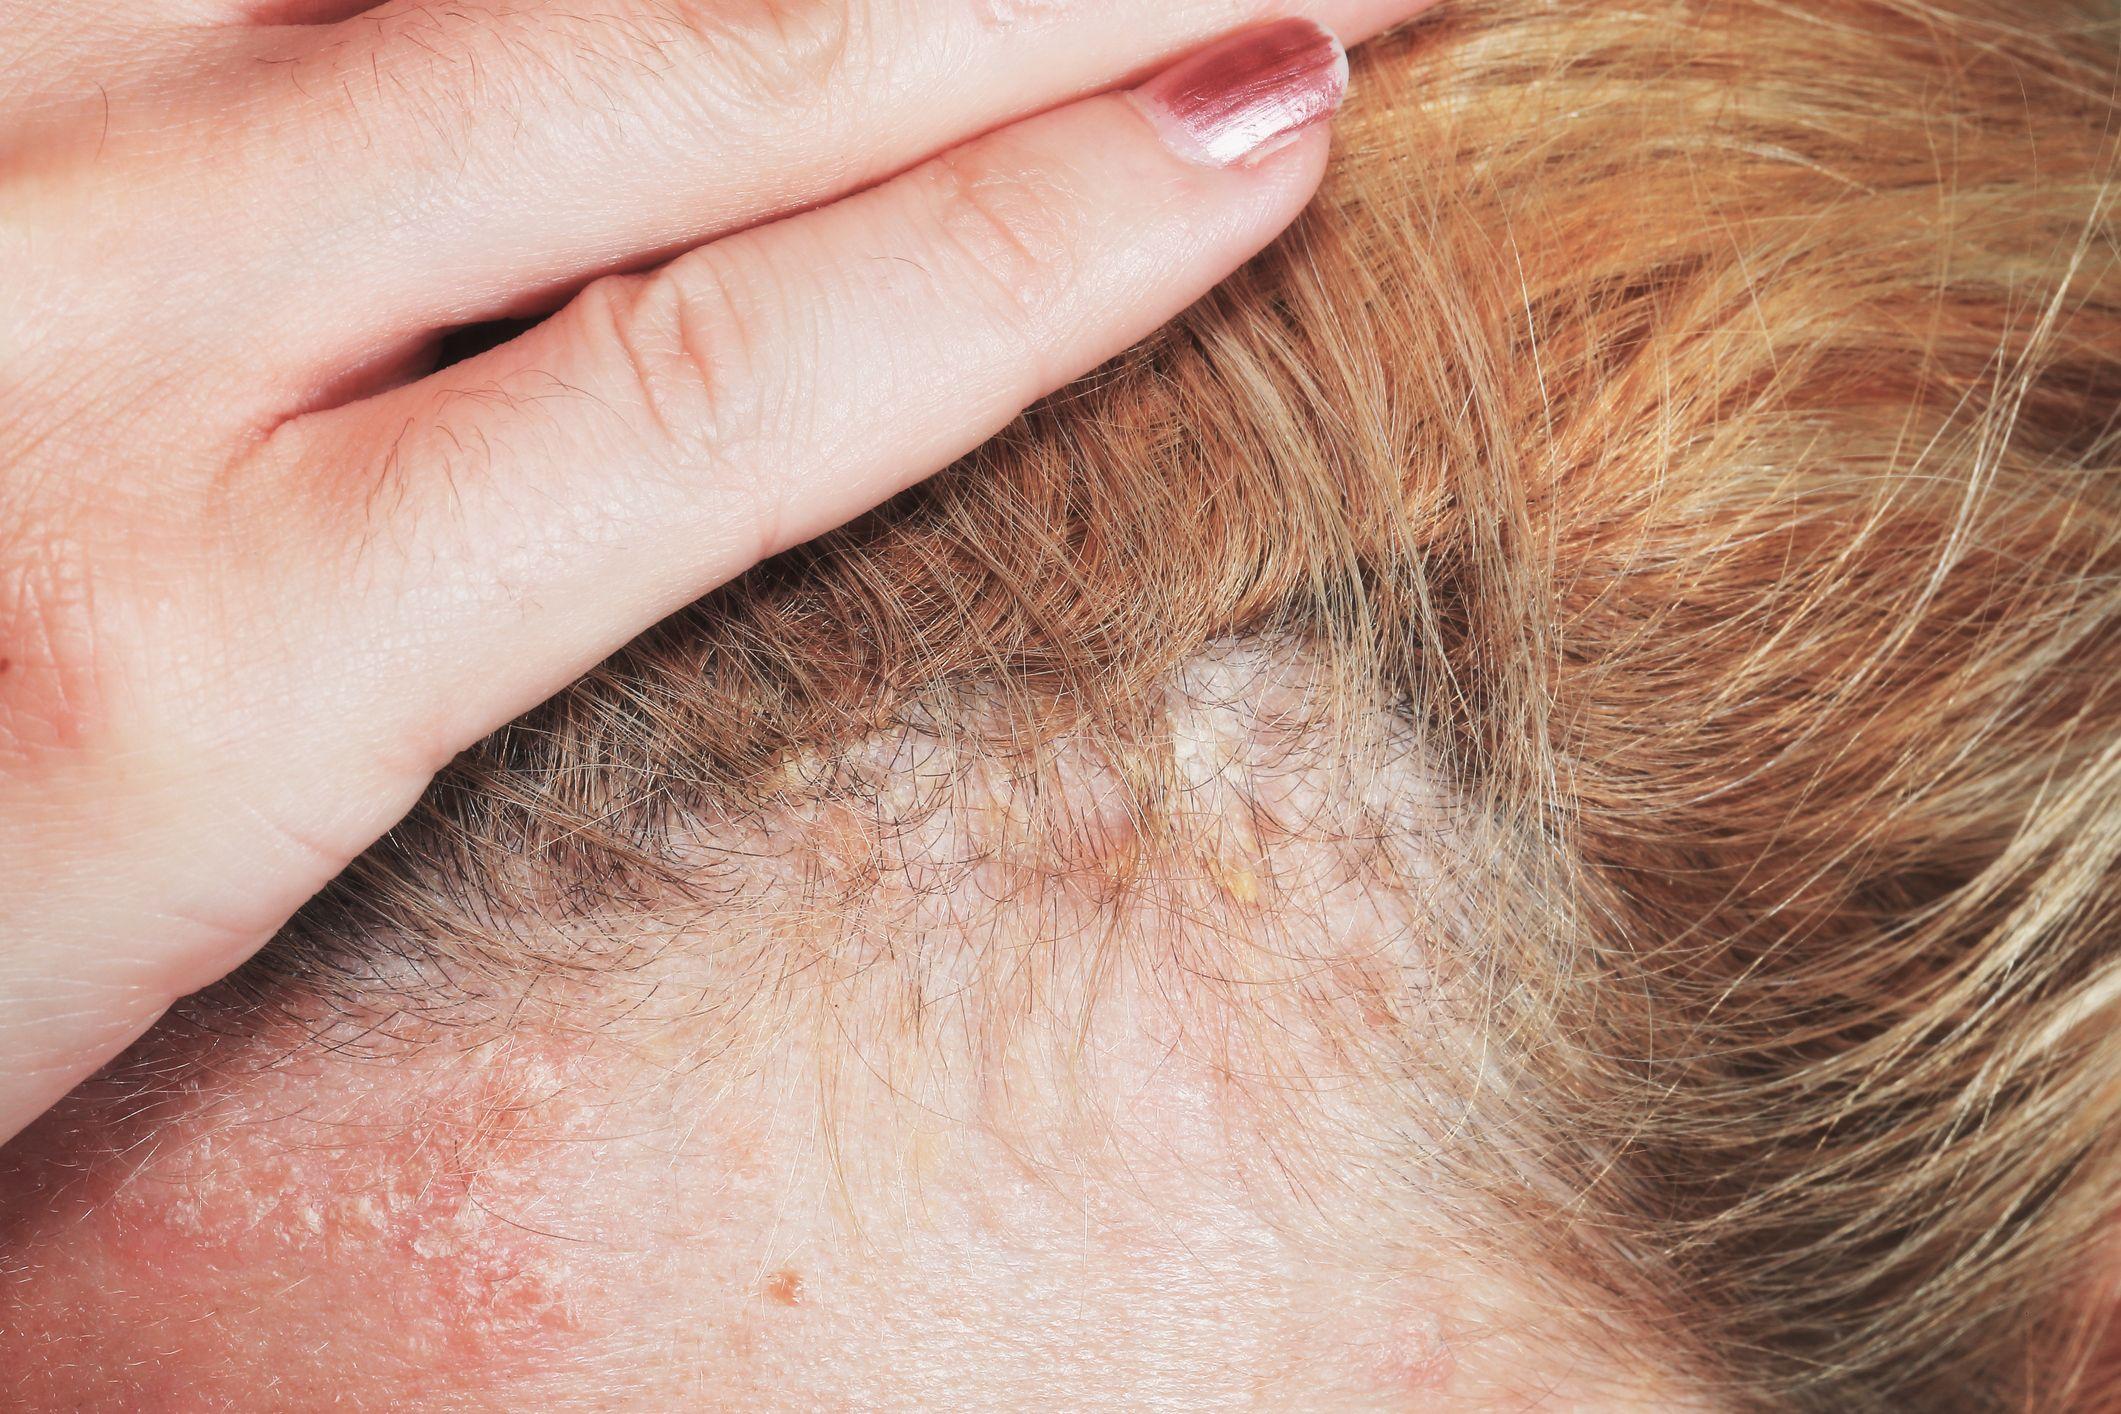 Hair psoriasis